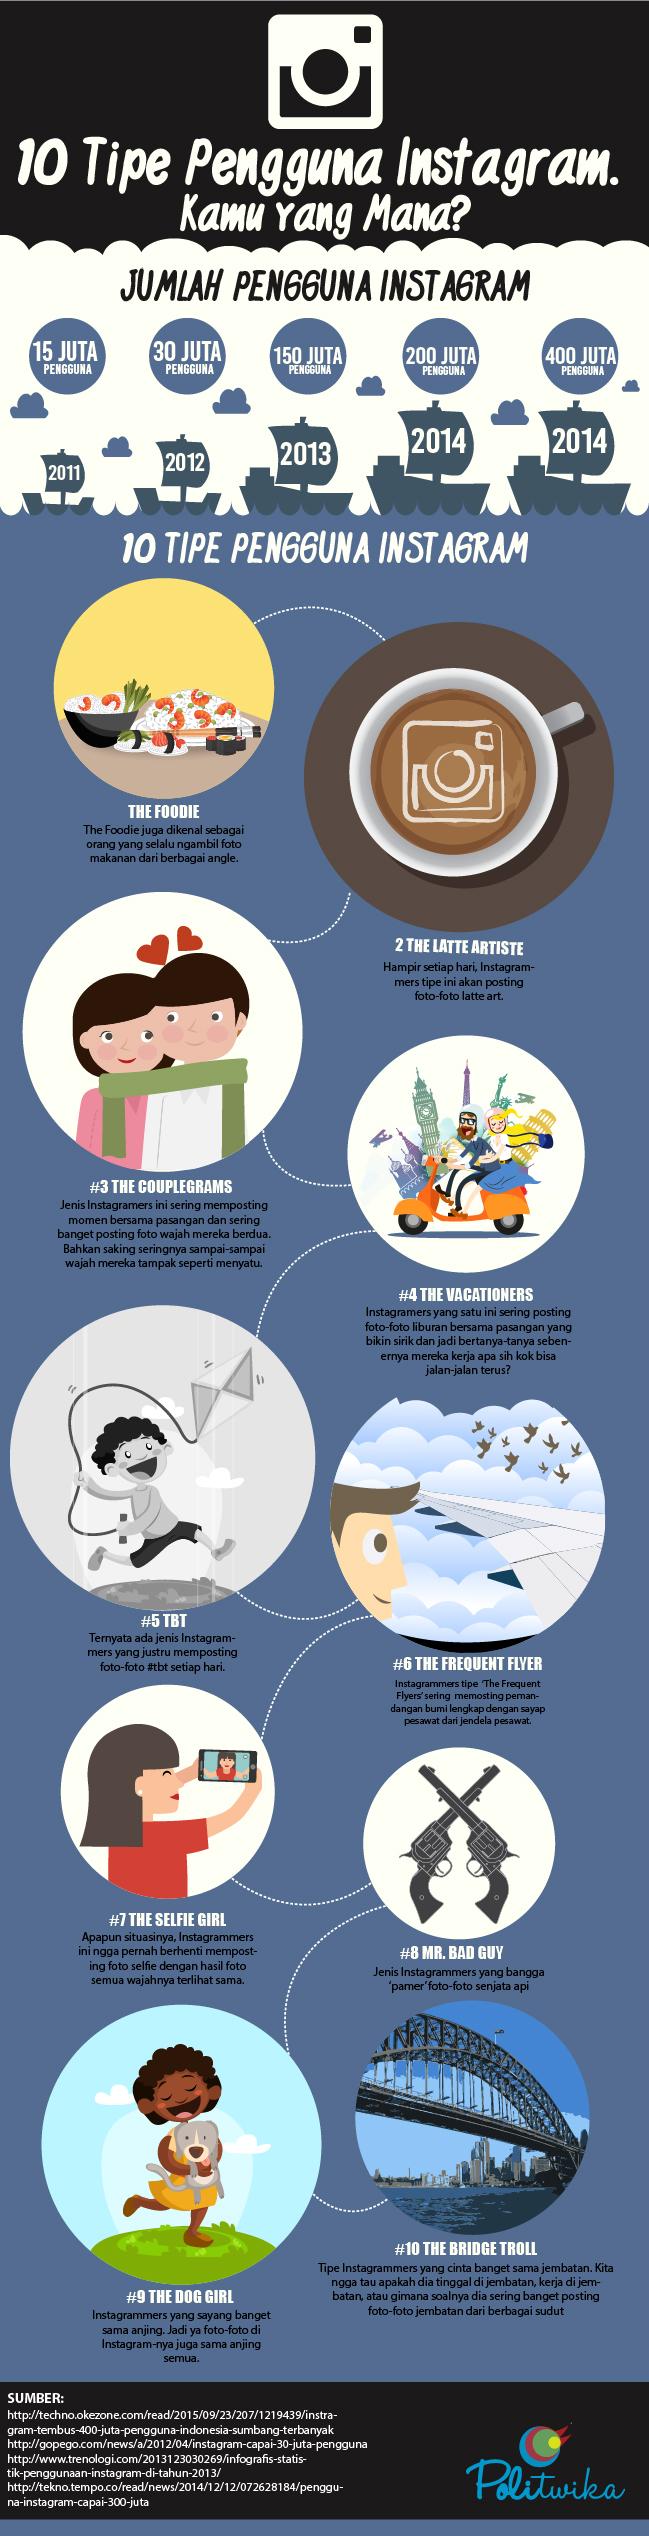 infografik-10-tipe-pengguna-instagram